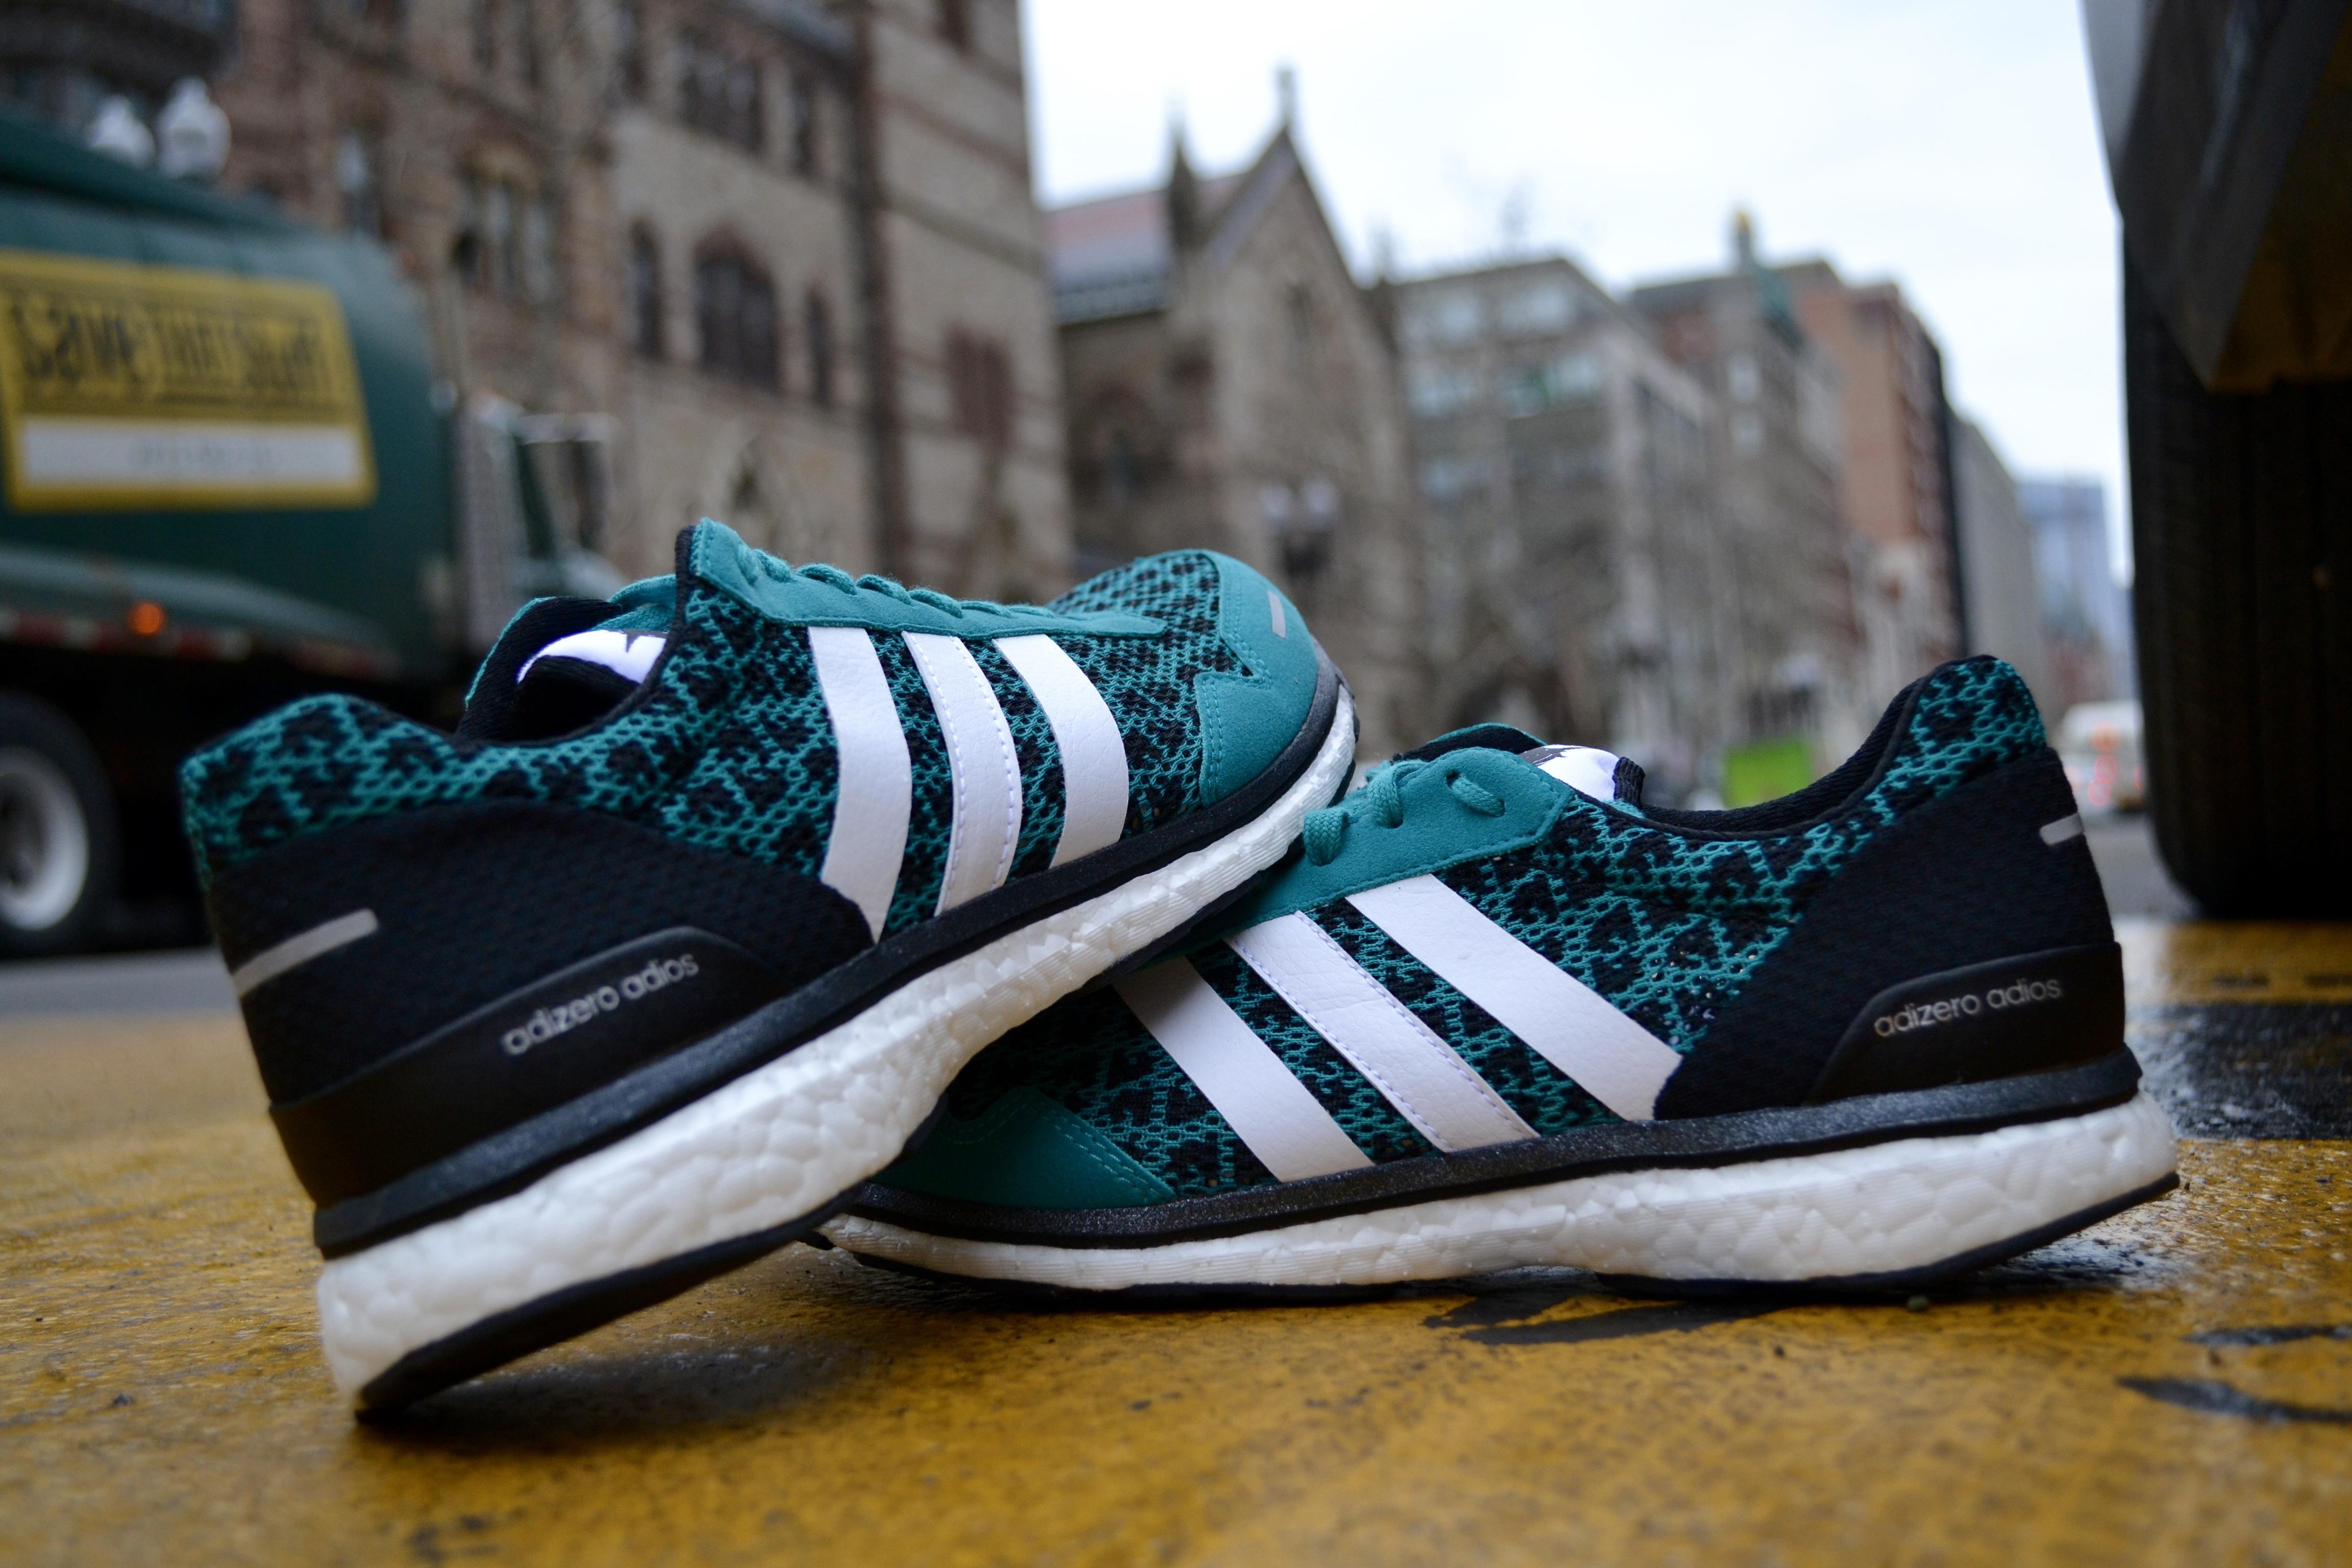 ... adidas Adizero Adios Boost  adizero Adios 3  adidas Boston Marathon ... e1e3cc16c